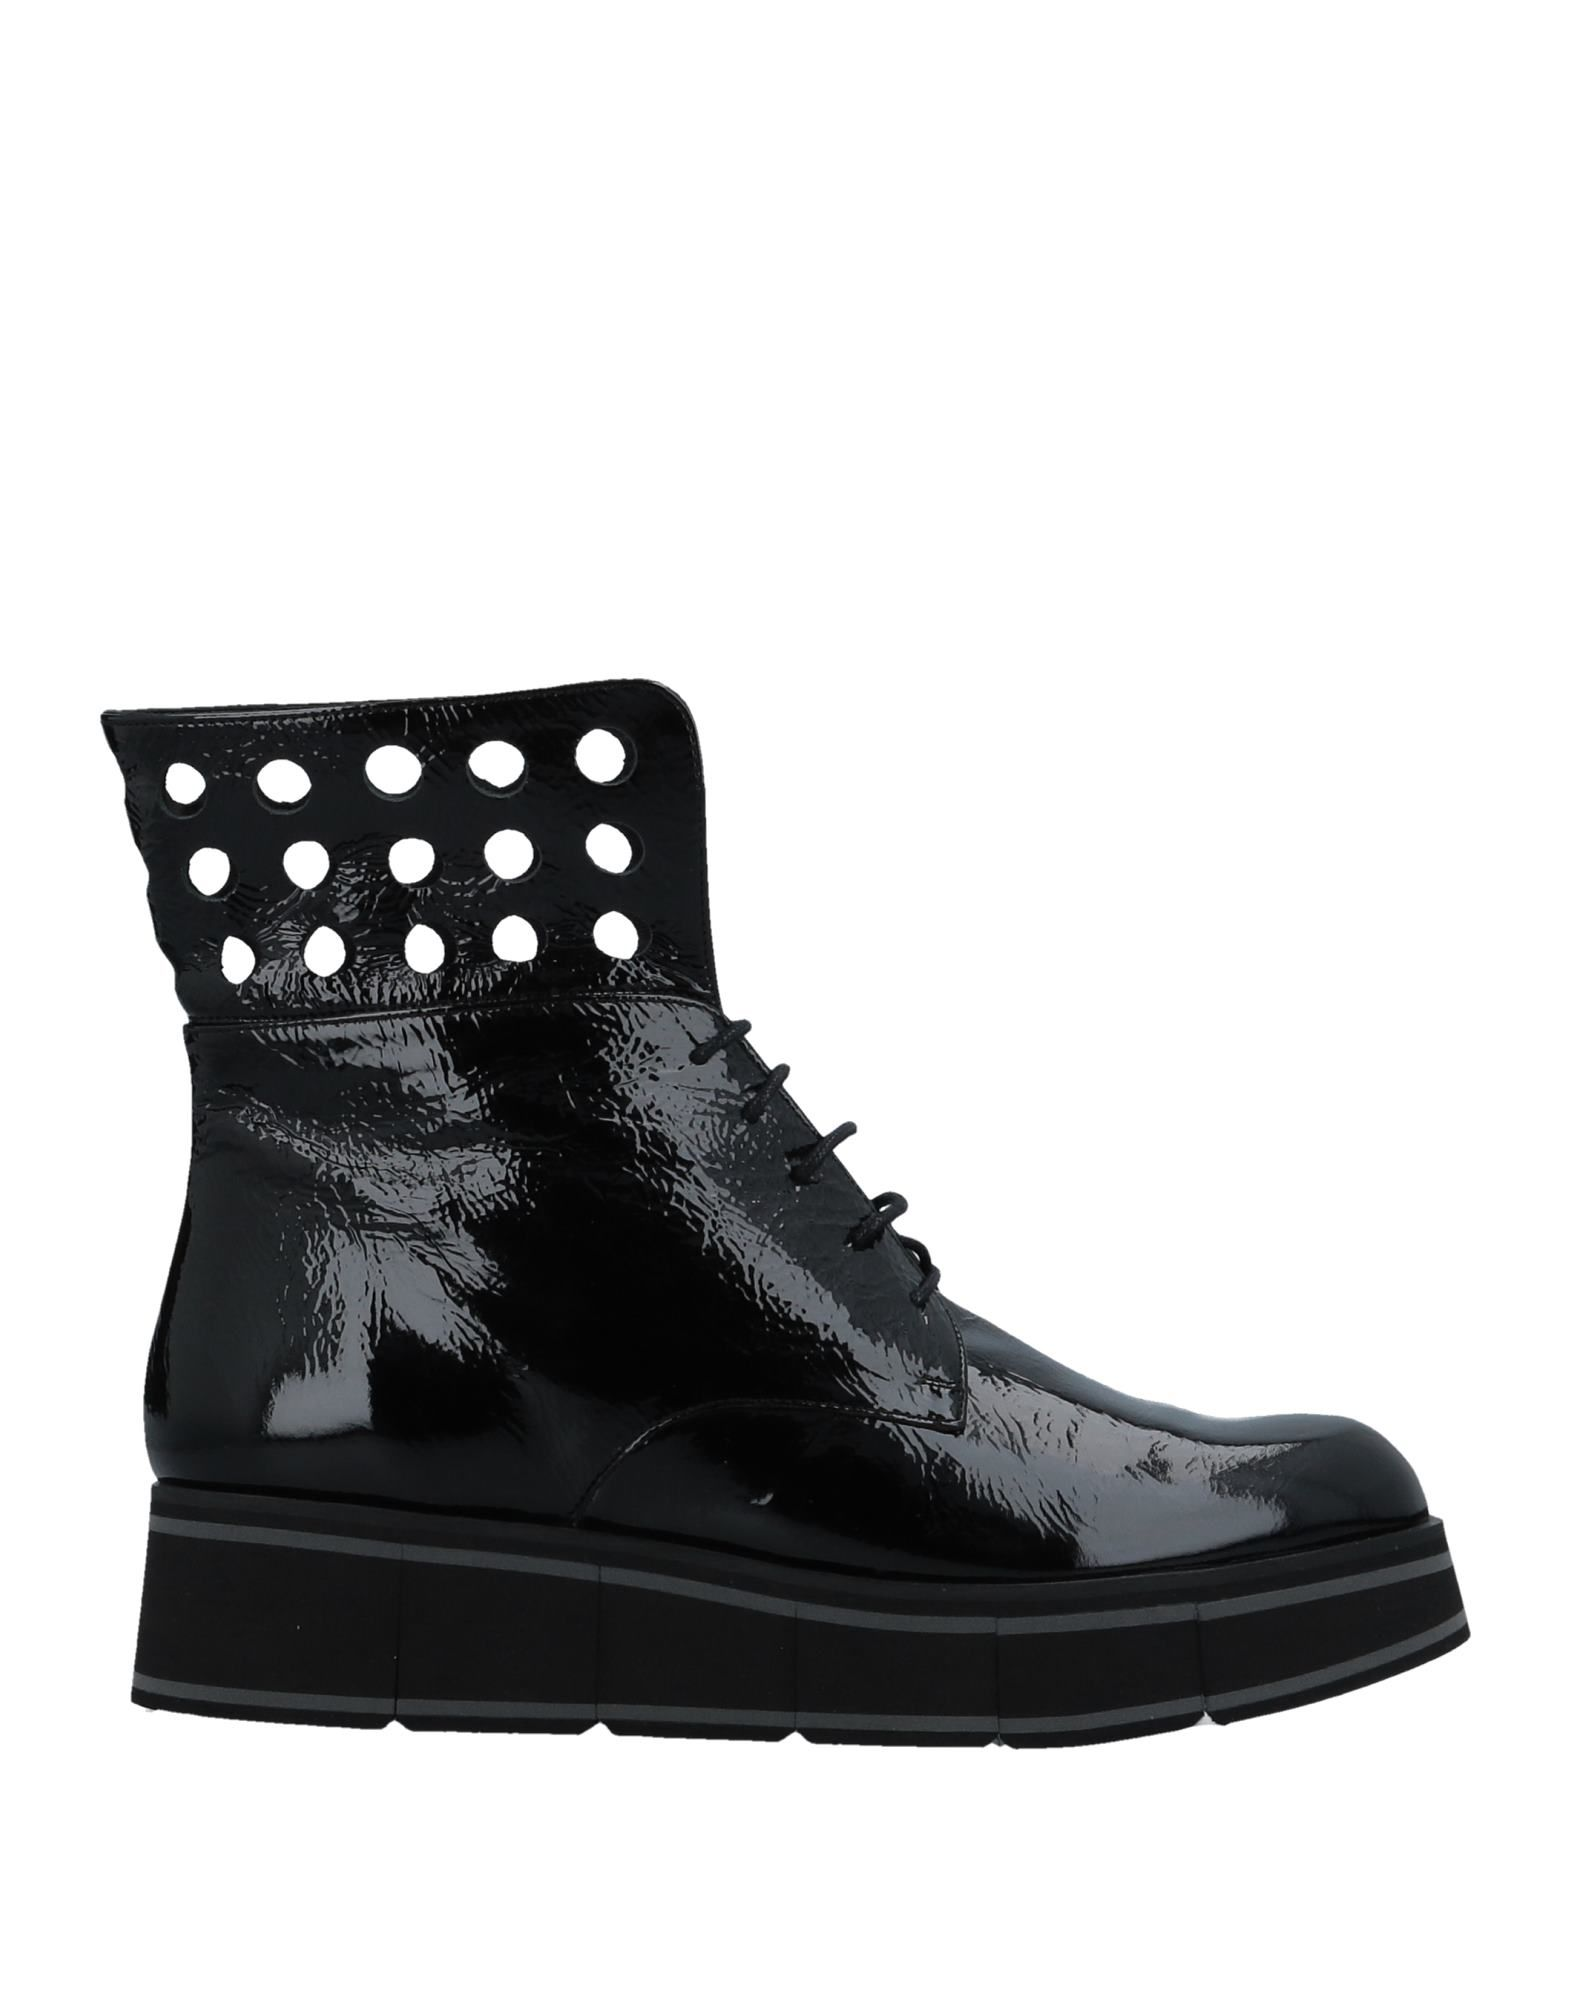 Stilvolle billige Schuhe Paloma Barceló Stiefelette Damen  11510421KW